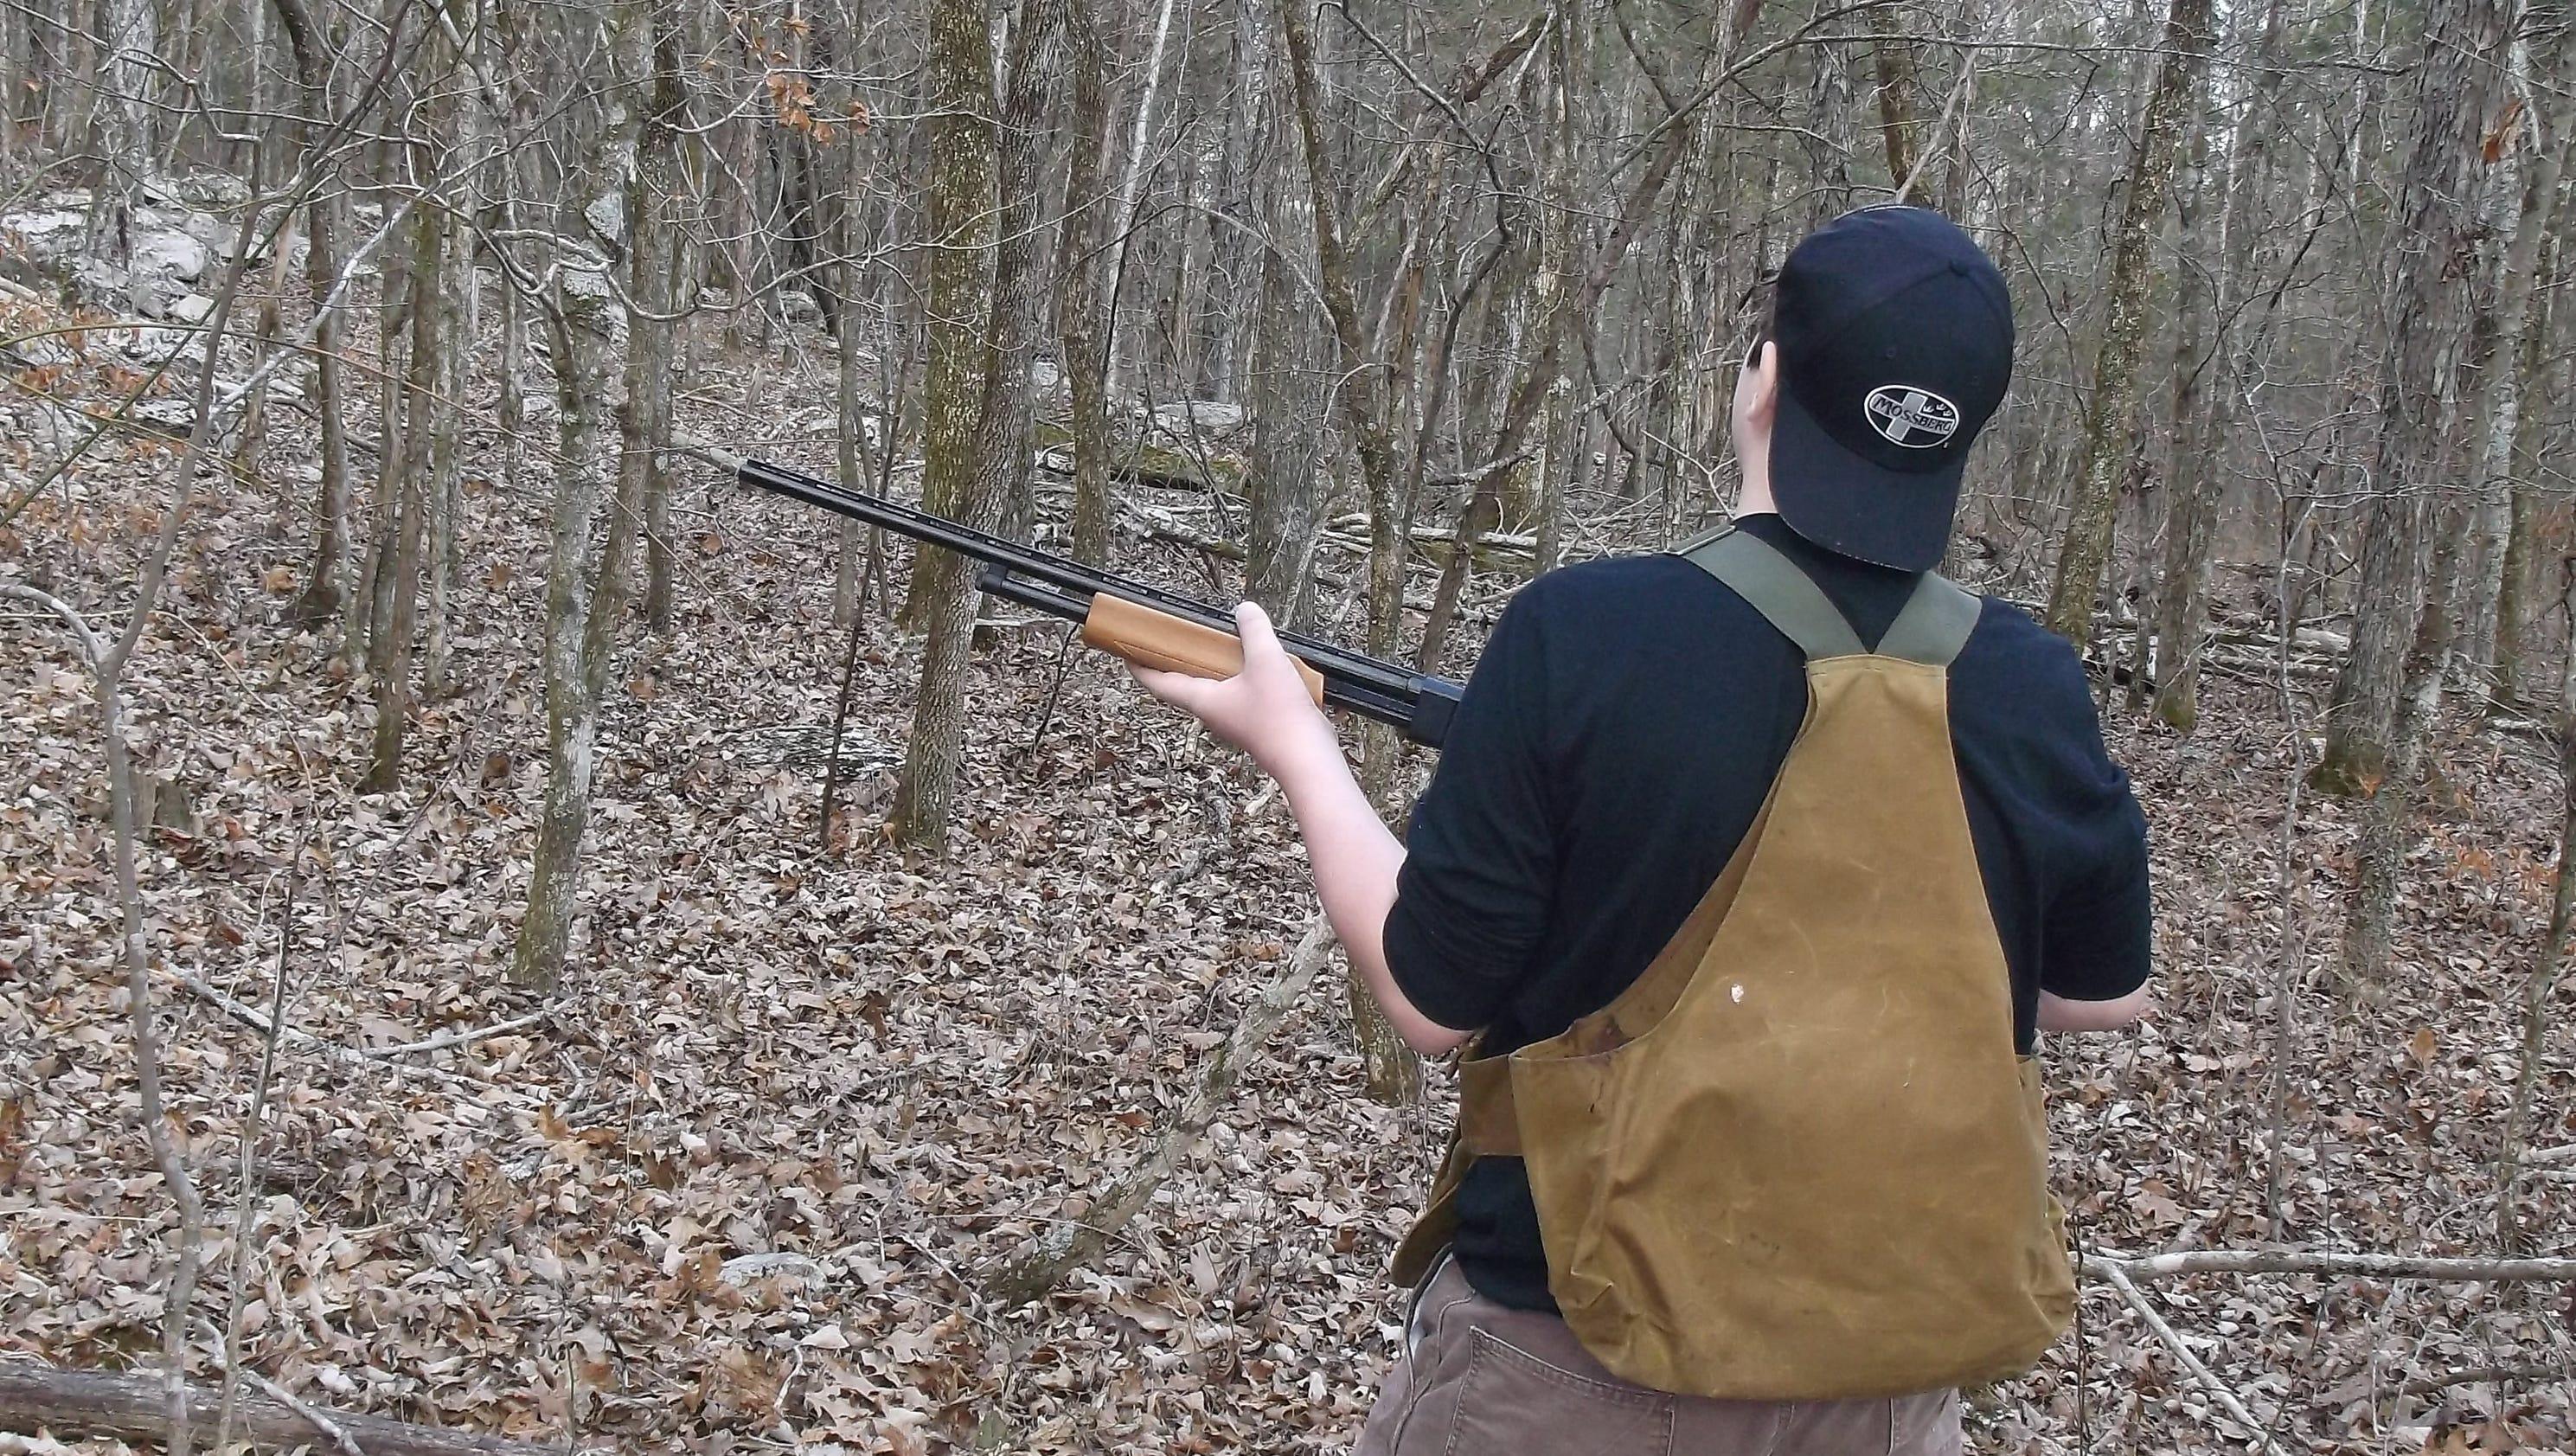 2016 17 hunting seasons on horizon around kentucky and indiana